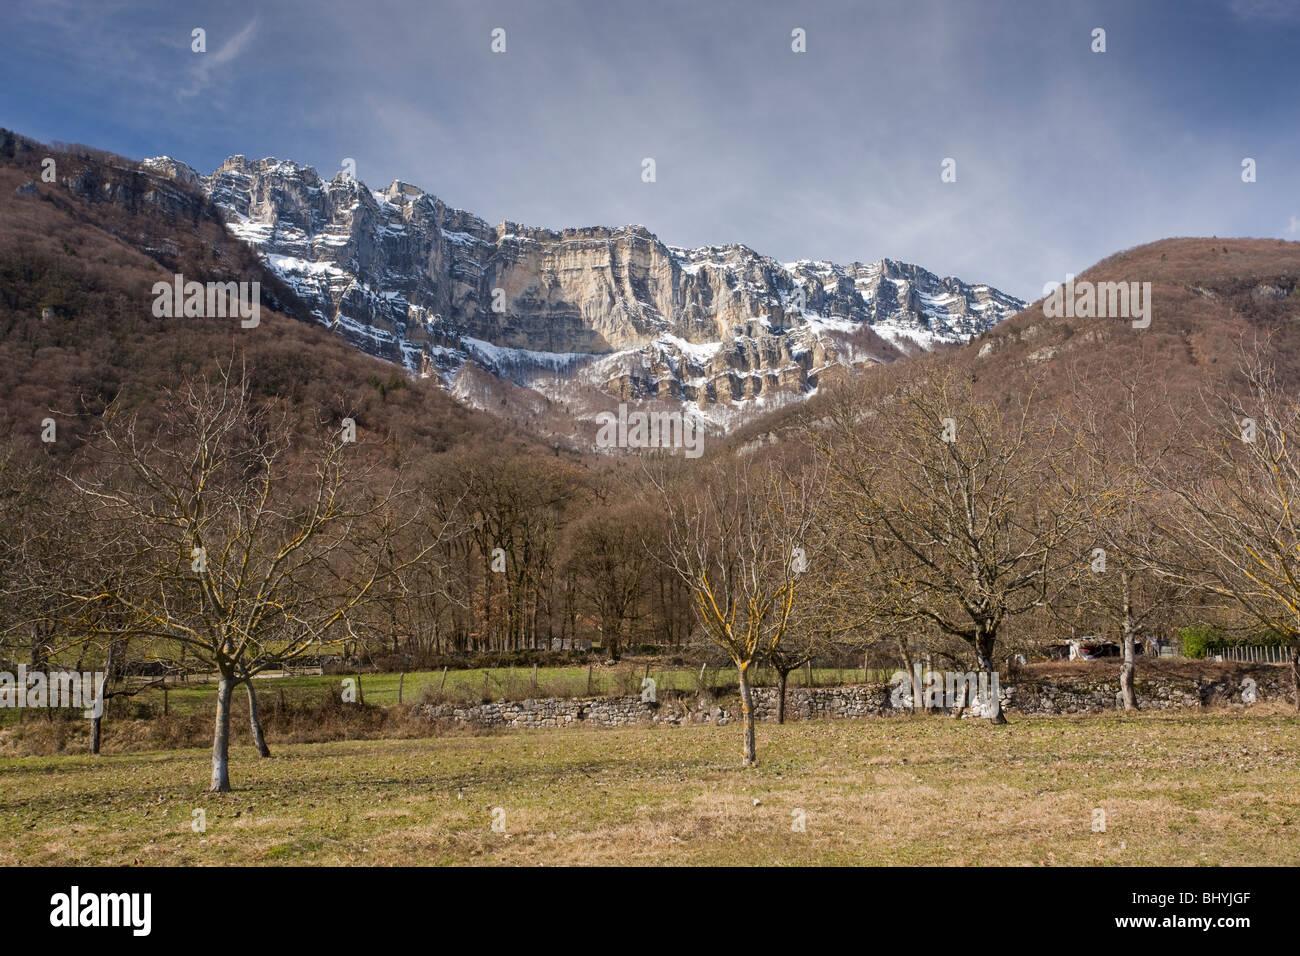 Cirque de St Meme, on the east side of the Massif de La Chartreuse mountains, regional natural Park, east France. - Stock Image